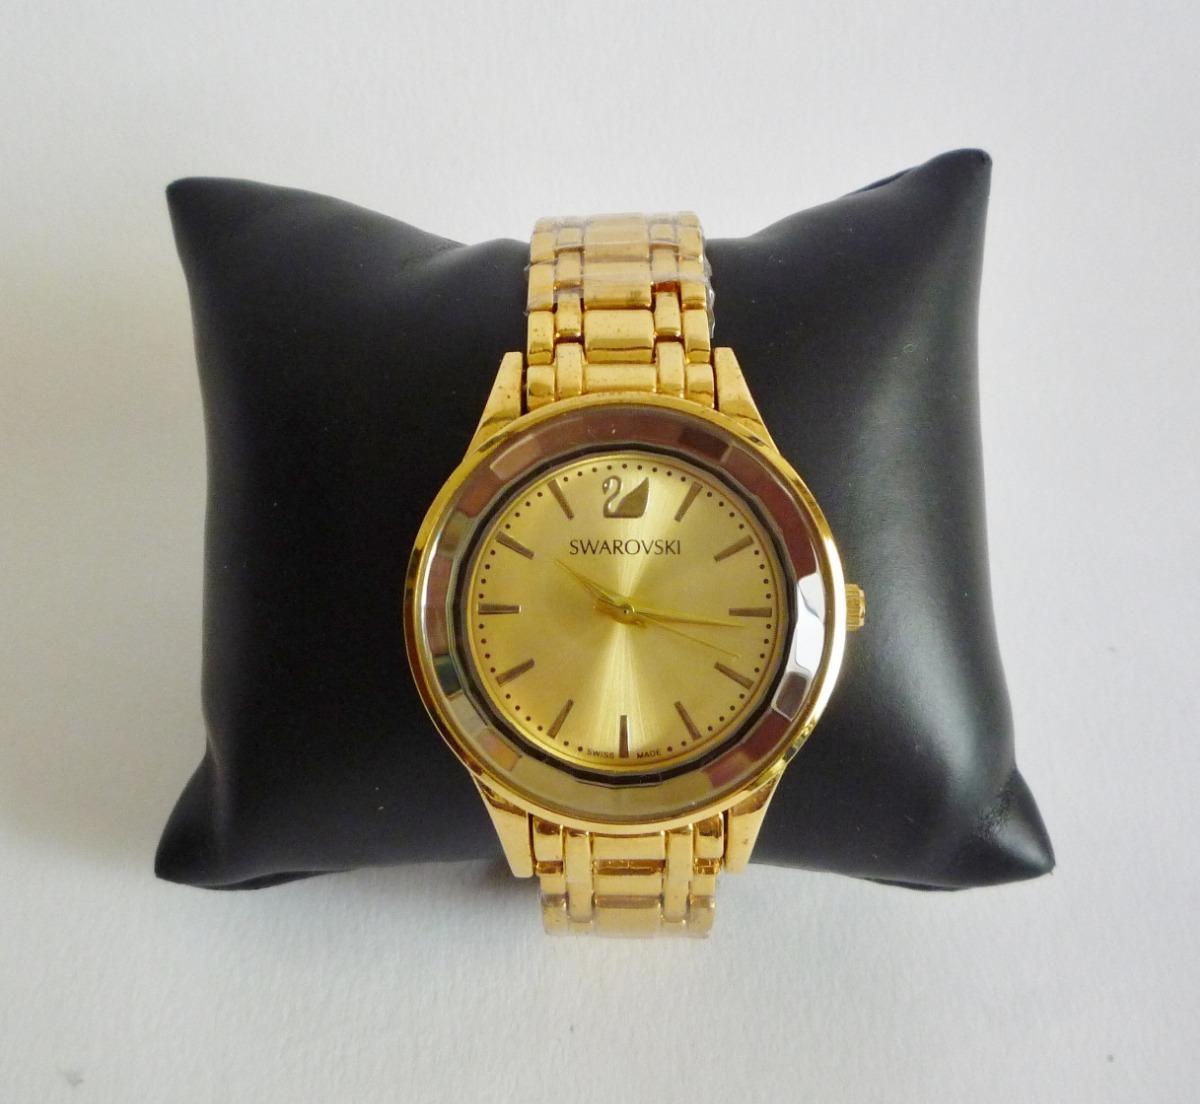 2b445bfda9a4 Reloj Pulsera Swarovski Regalo Para Mamá, Mujer, Dama